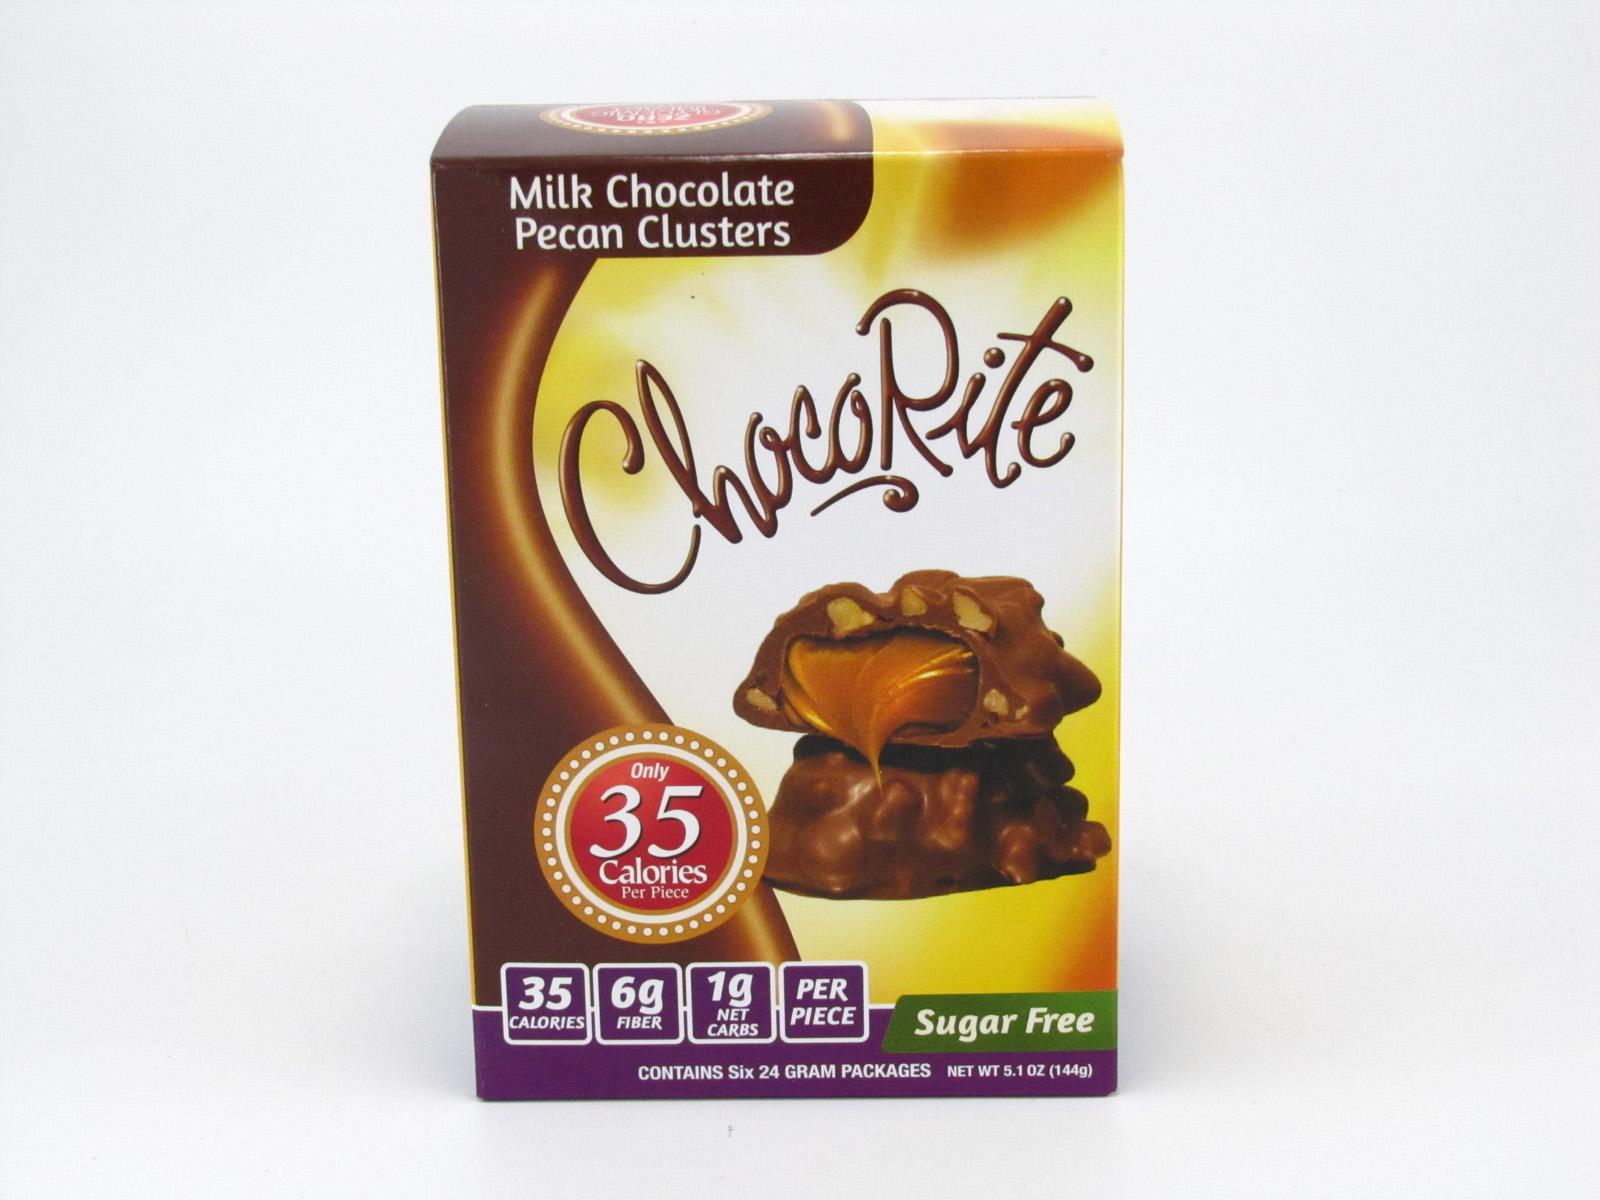 Healthsmart Chocorite Bar ( Value pack ) - Milk Chocolate Pecan Clusters- front view